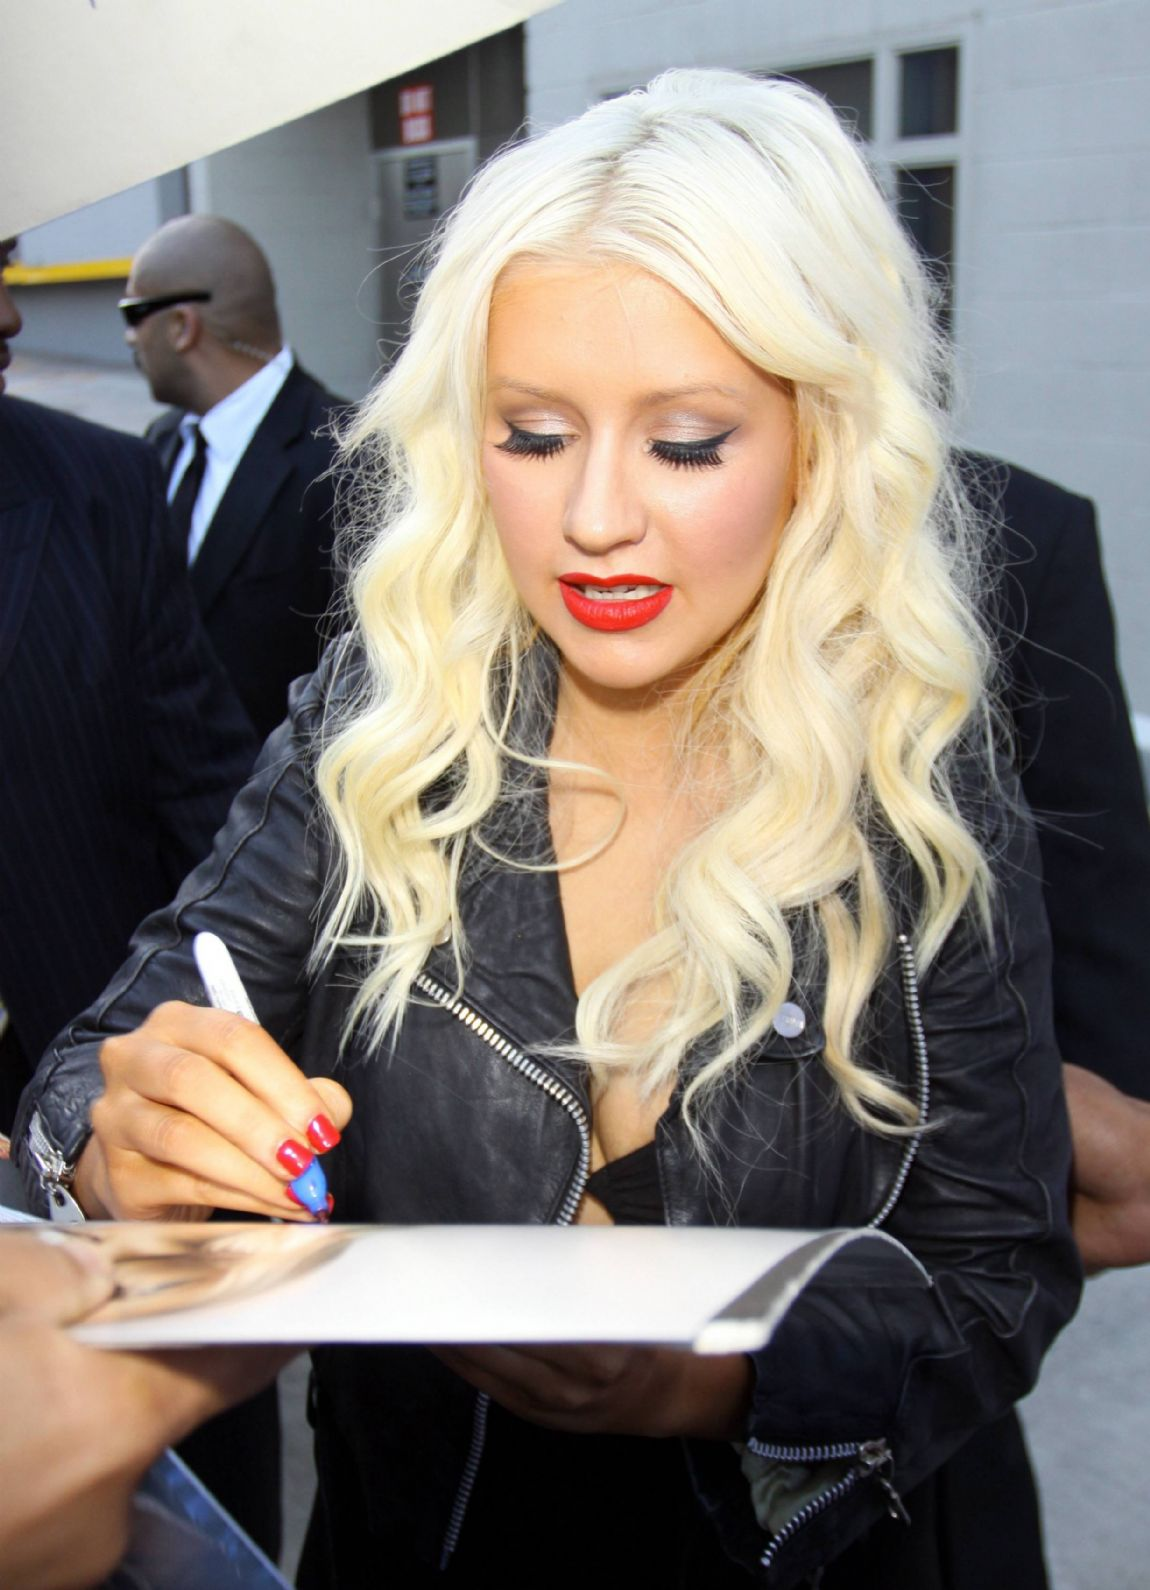 http://2.bp.blogspot.com/-X3zXy_4IHM0/TeZn4ljkKZI/AAAAAAAAKcs/FYVTQB-U7WA/s1600/Singer+Christina+Aguilera+giving+autographs+in+public+2011+%25282%2529.jpg